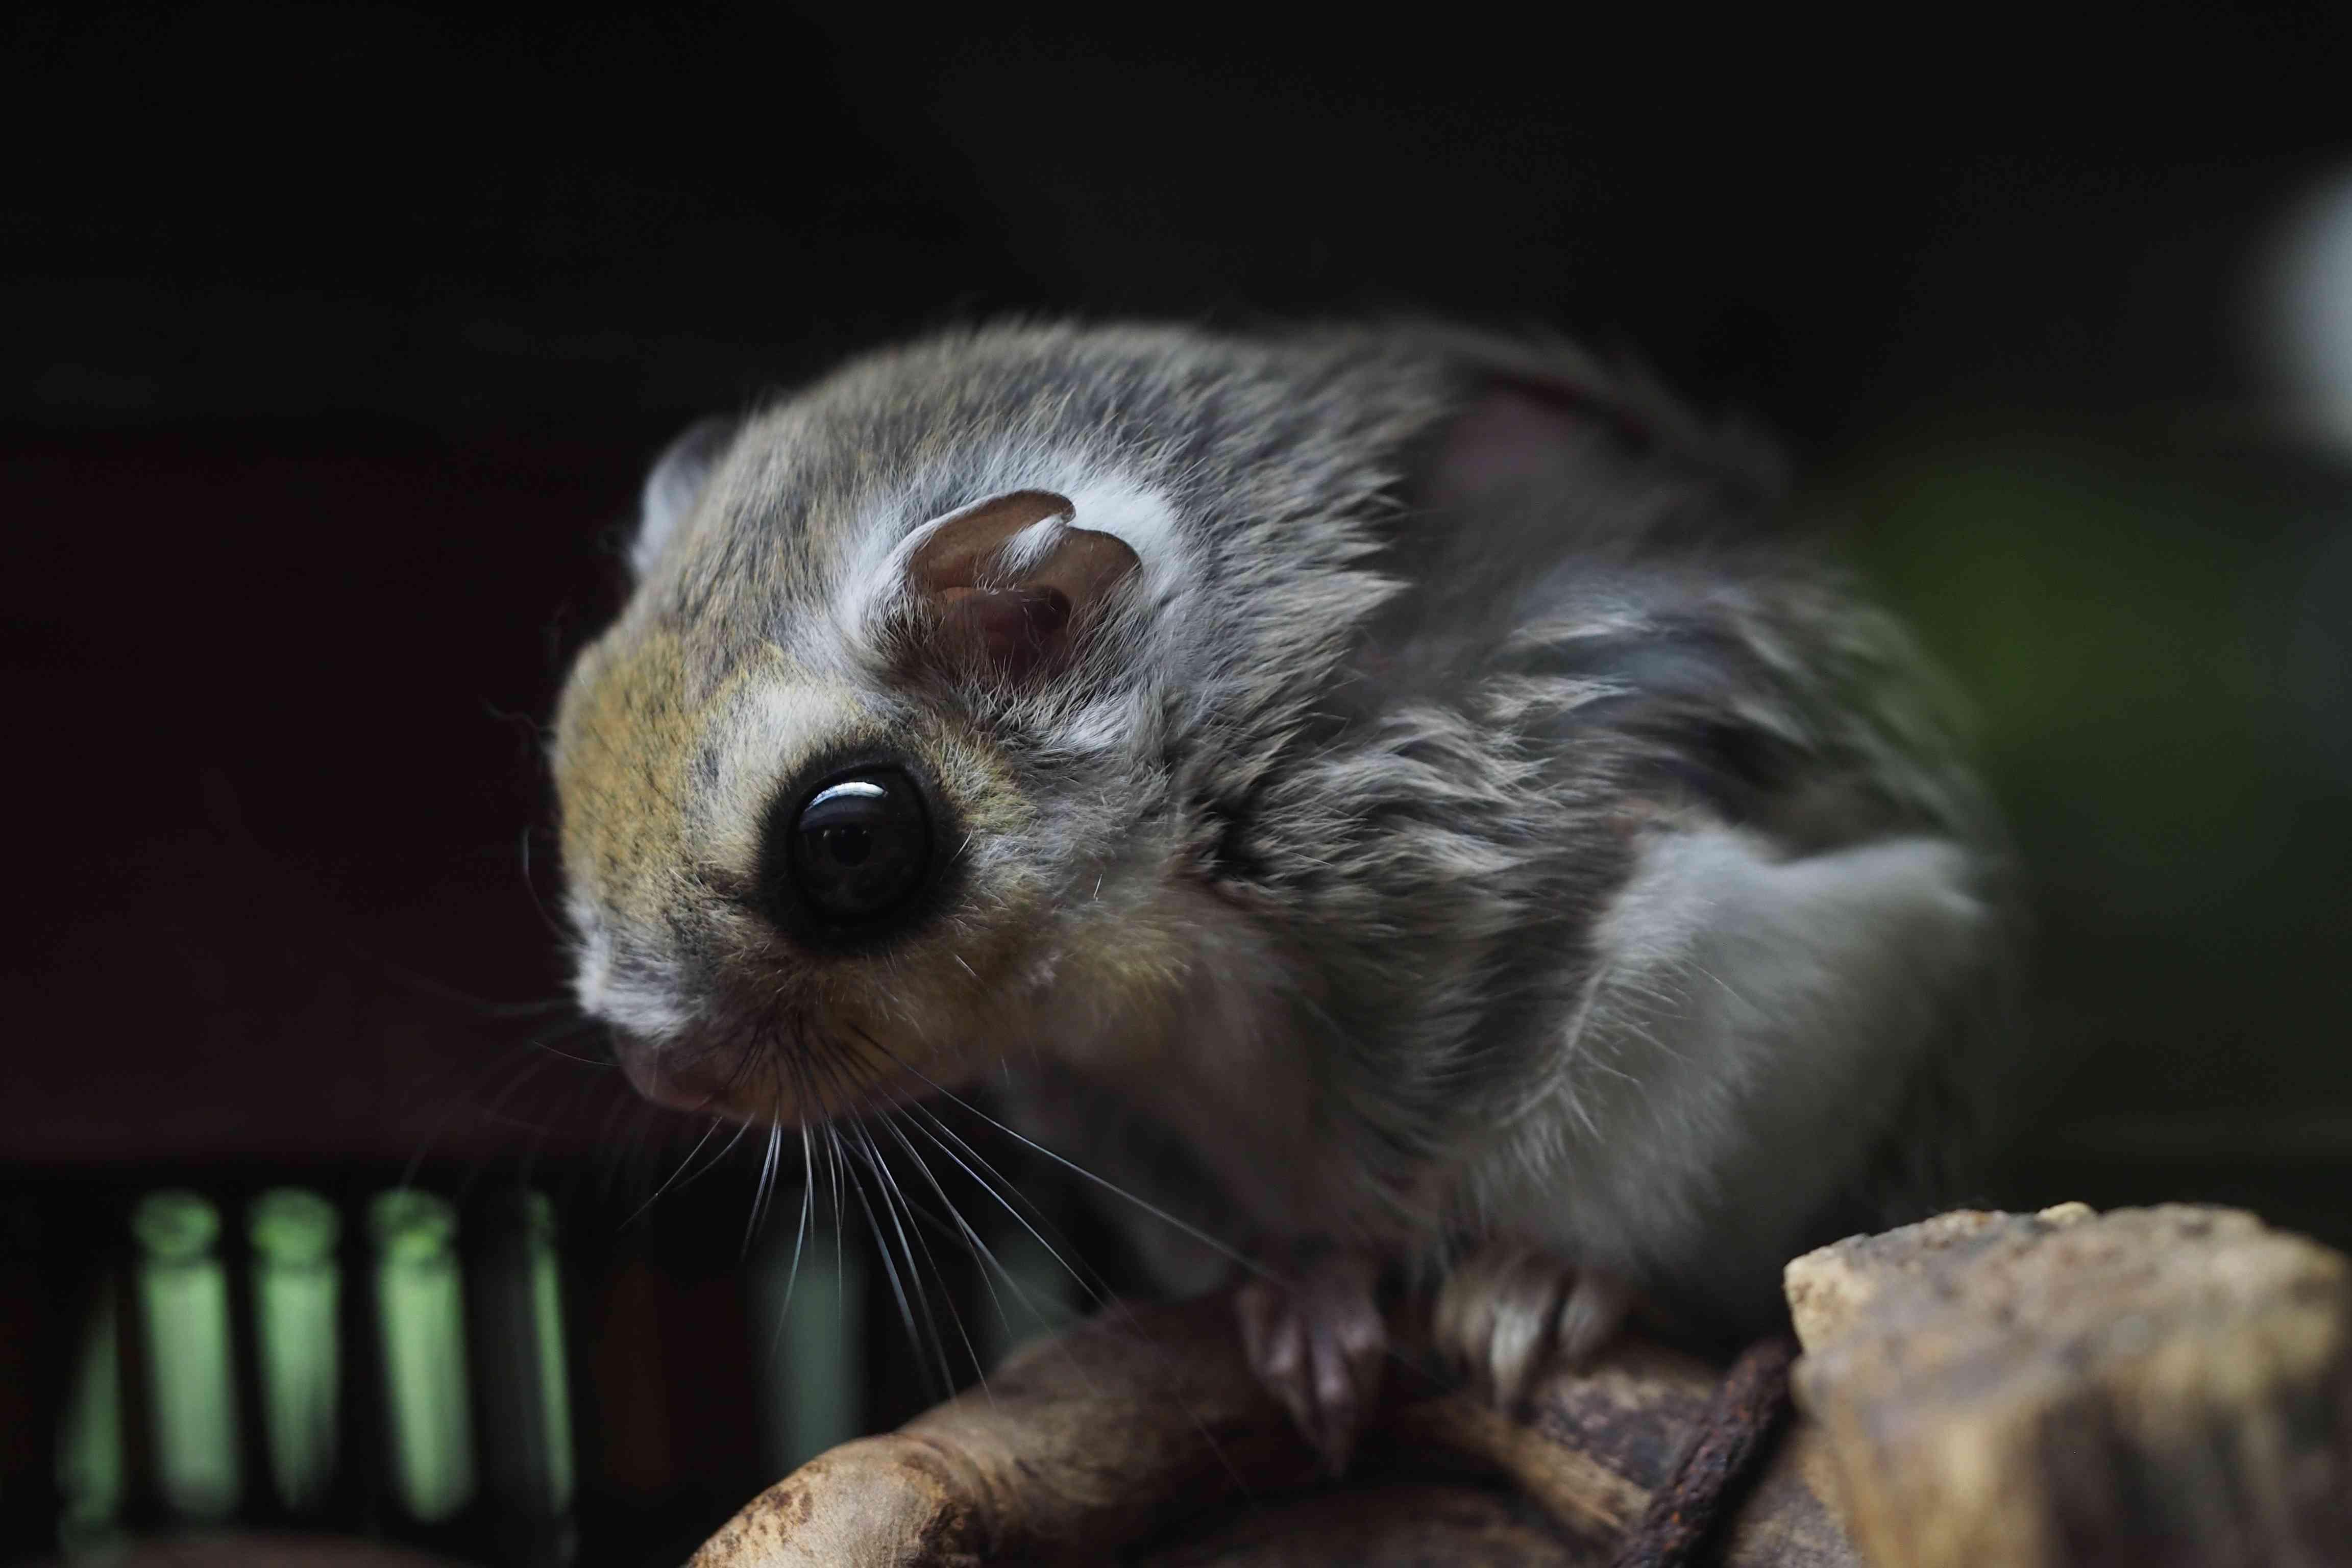 Hokkaido flying squirrel, Pteromys volans orii